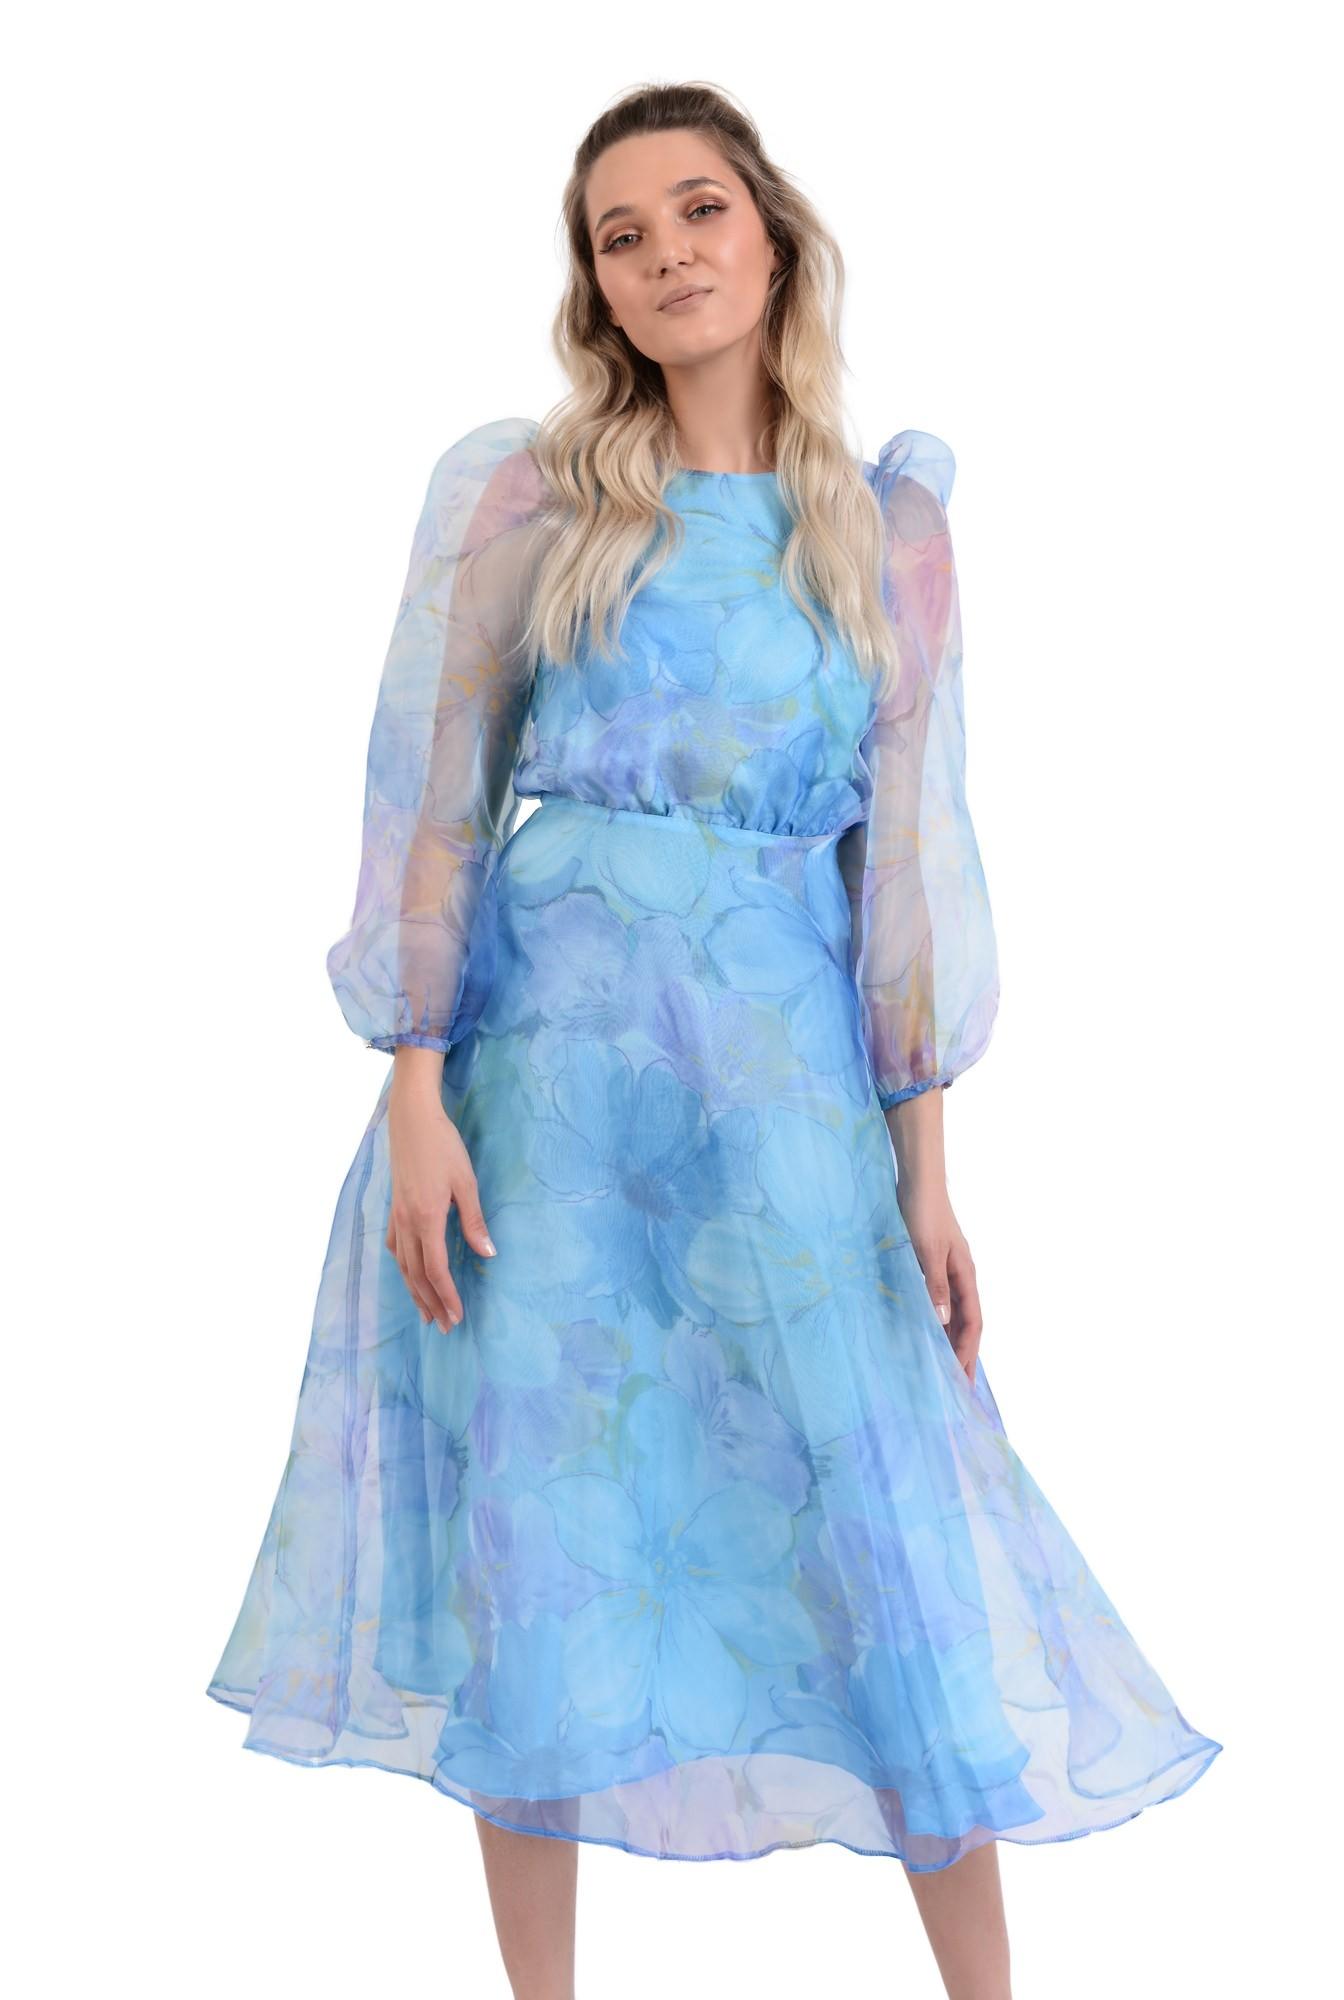 0 - rochie lunga, eleganta, din organza, maneci bufante, imprimeu floral